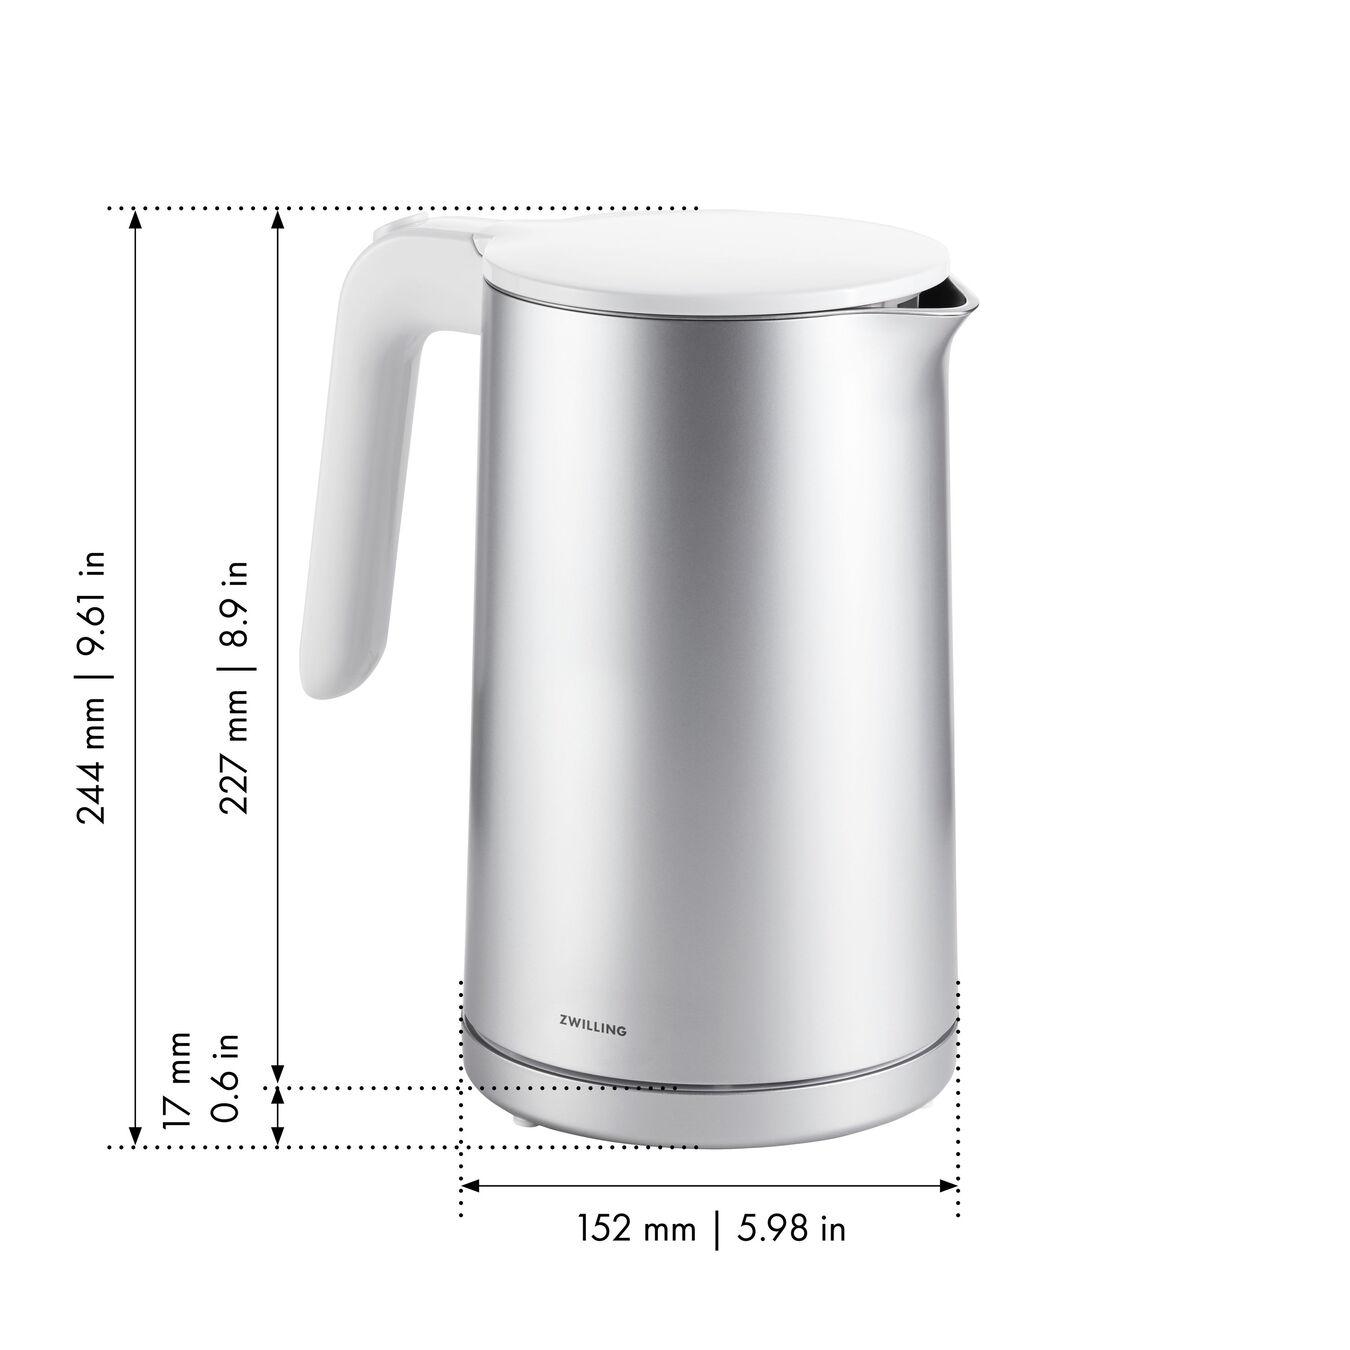 Wasserkocher, 1,5 l, Silber,,large 7